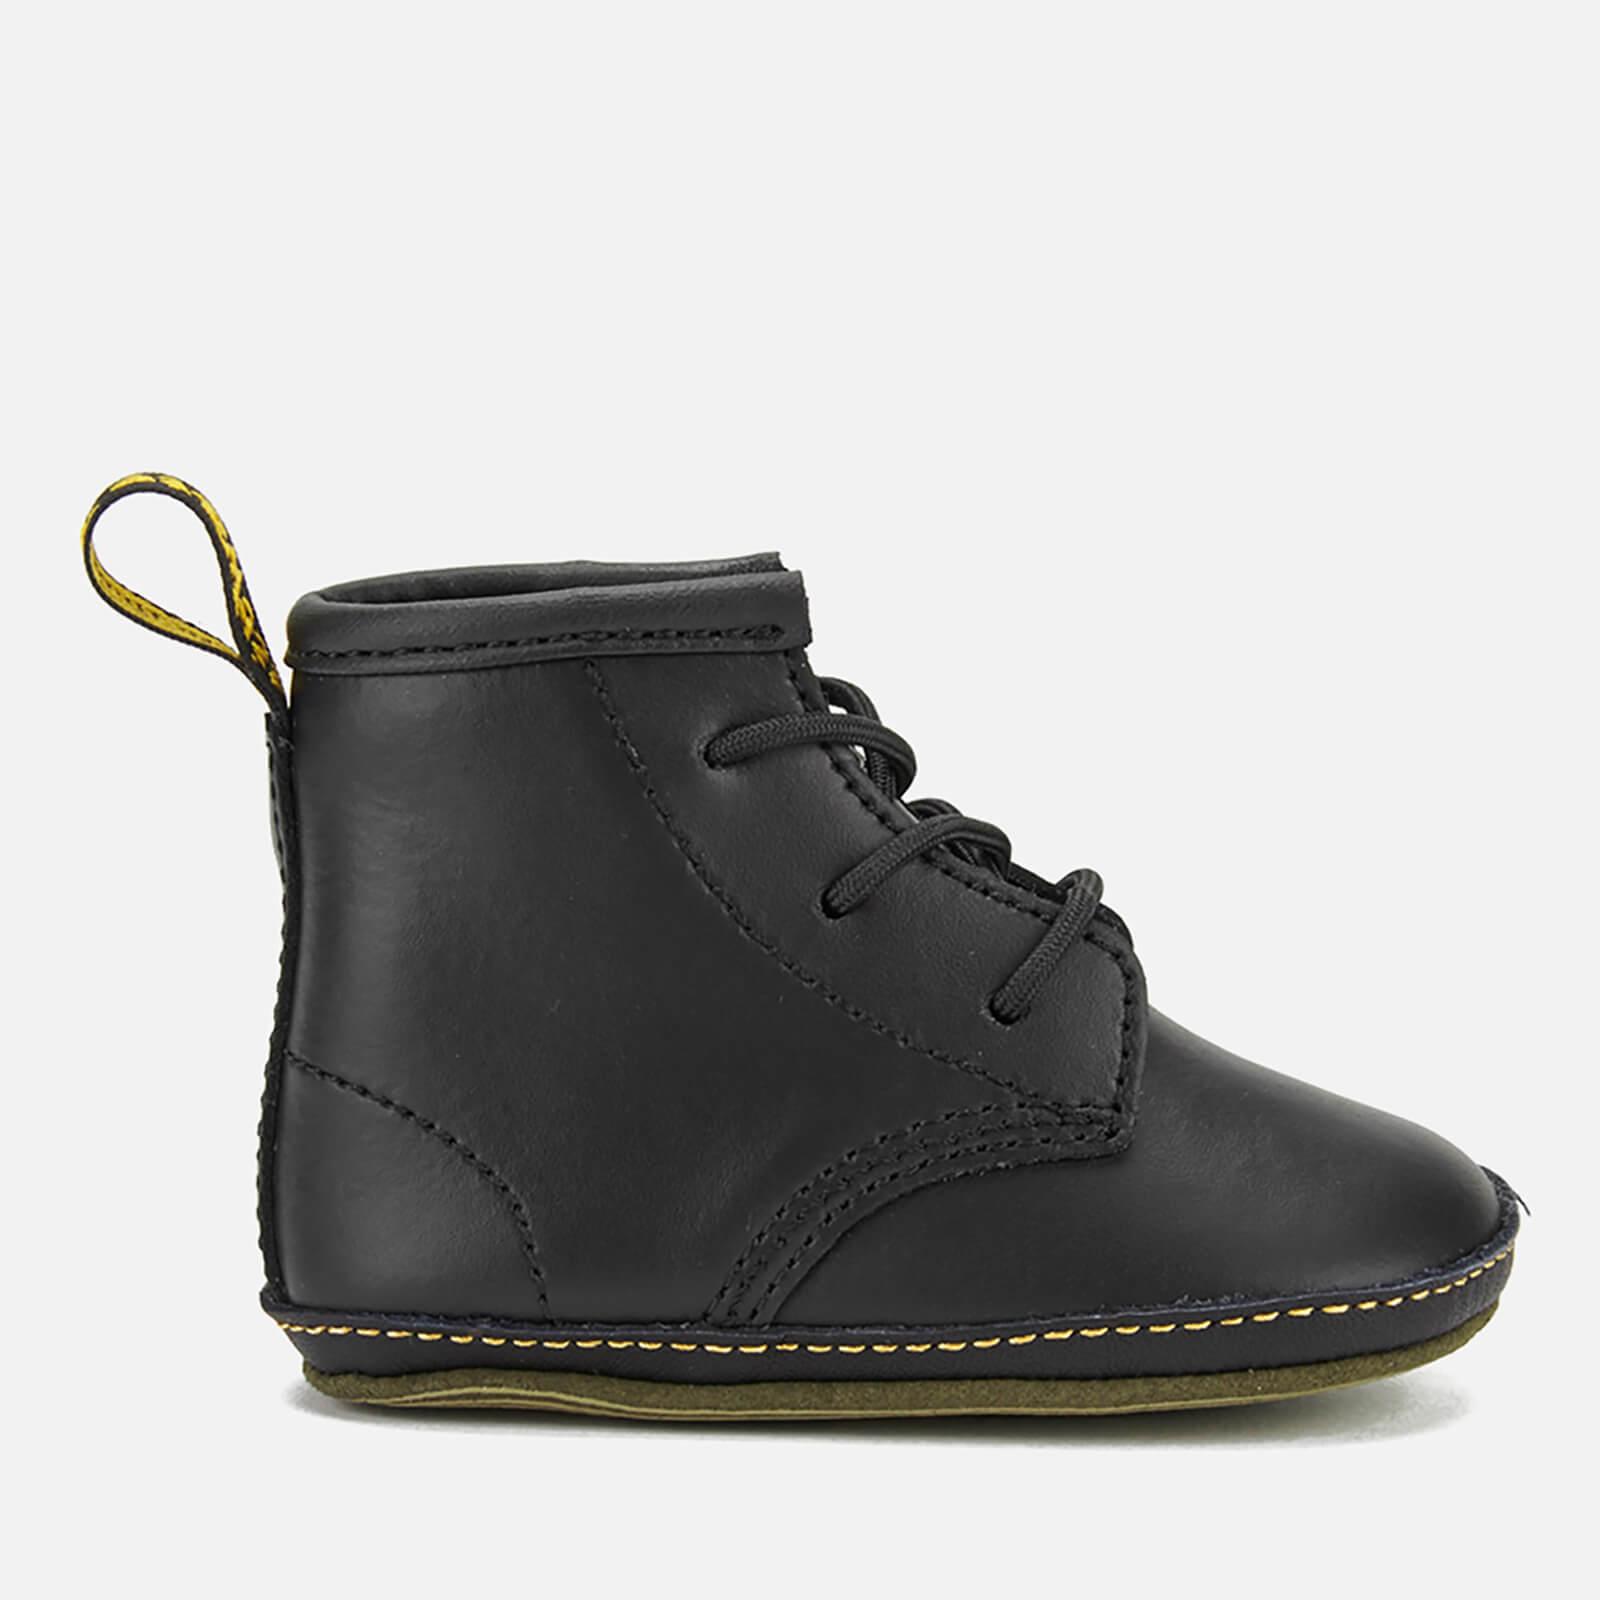 Dr. Martens Babies Auburn Kid Lamper Leather Boots - Black - UK 2 Baby - Black